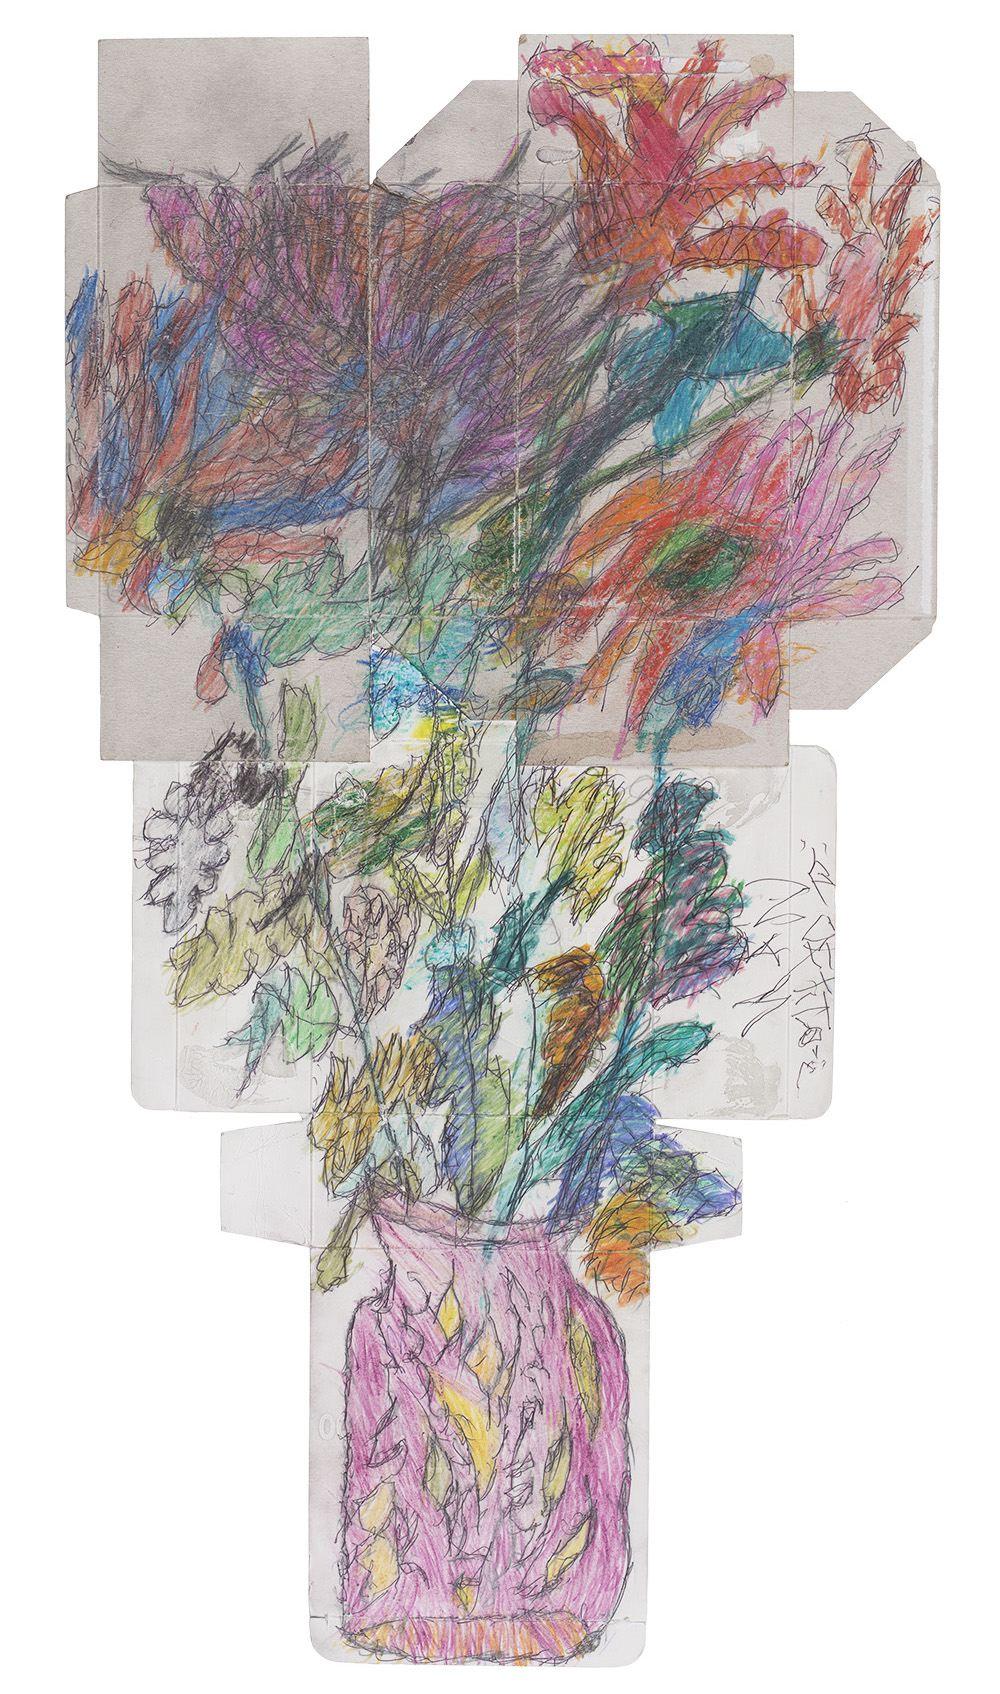 Ilya Natarevich    Untitled  , 2015 Ink, crayon, graphite on cardboard 28.25 x 15 inches 71.8 x 38.1 cm INa 12